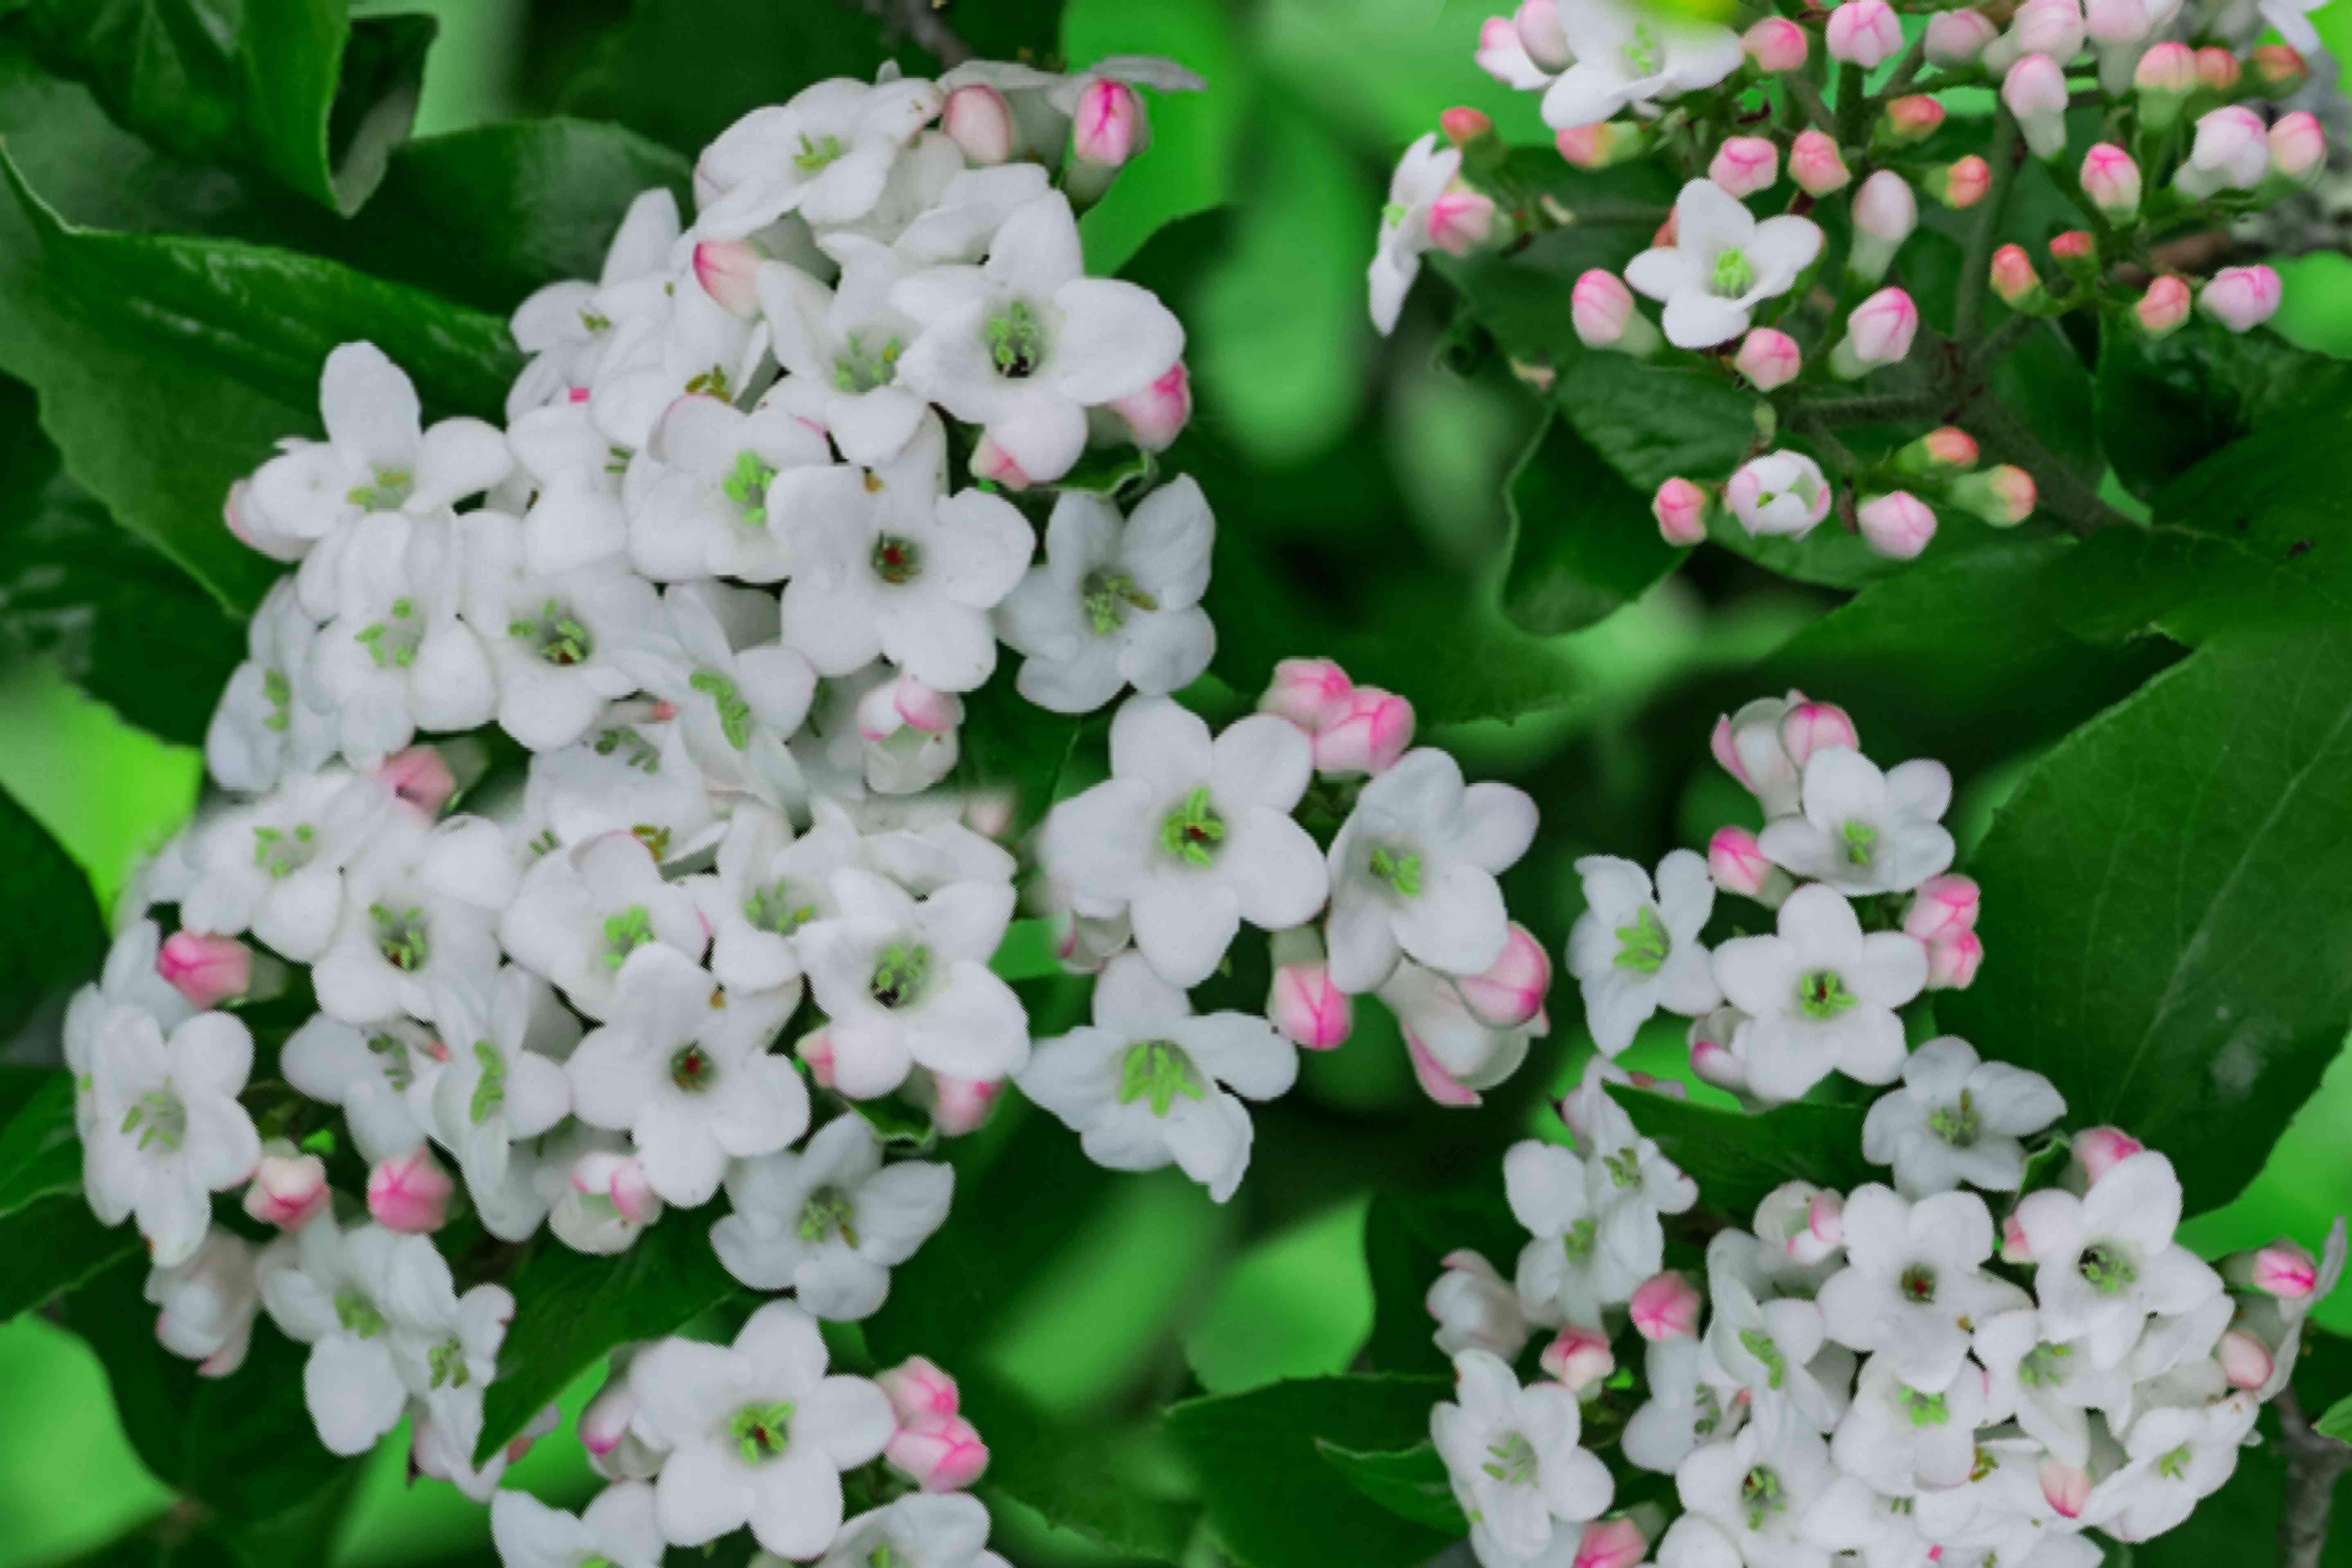 viburnum shrub detail